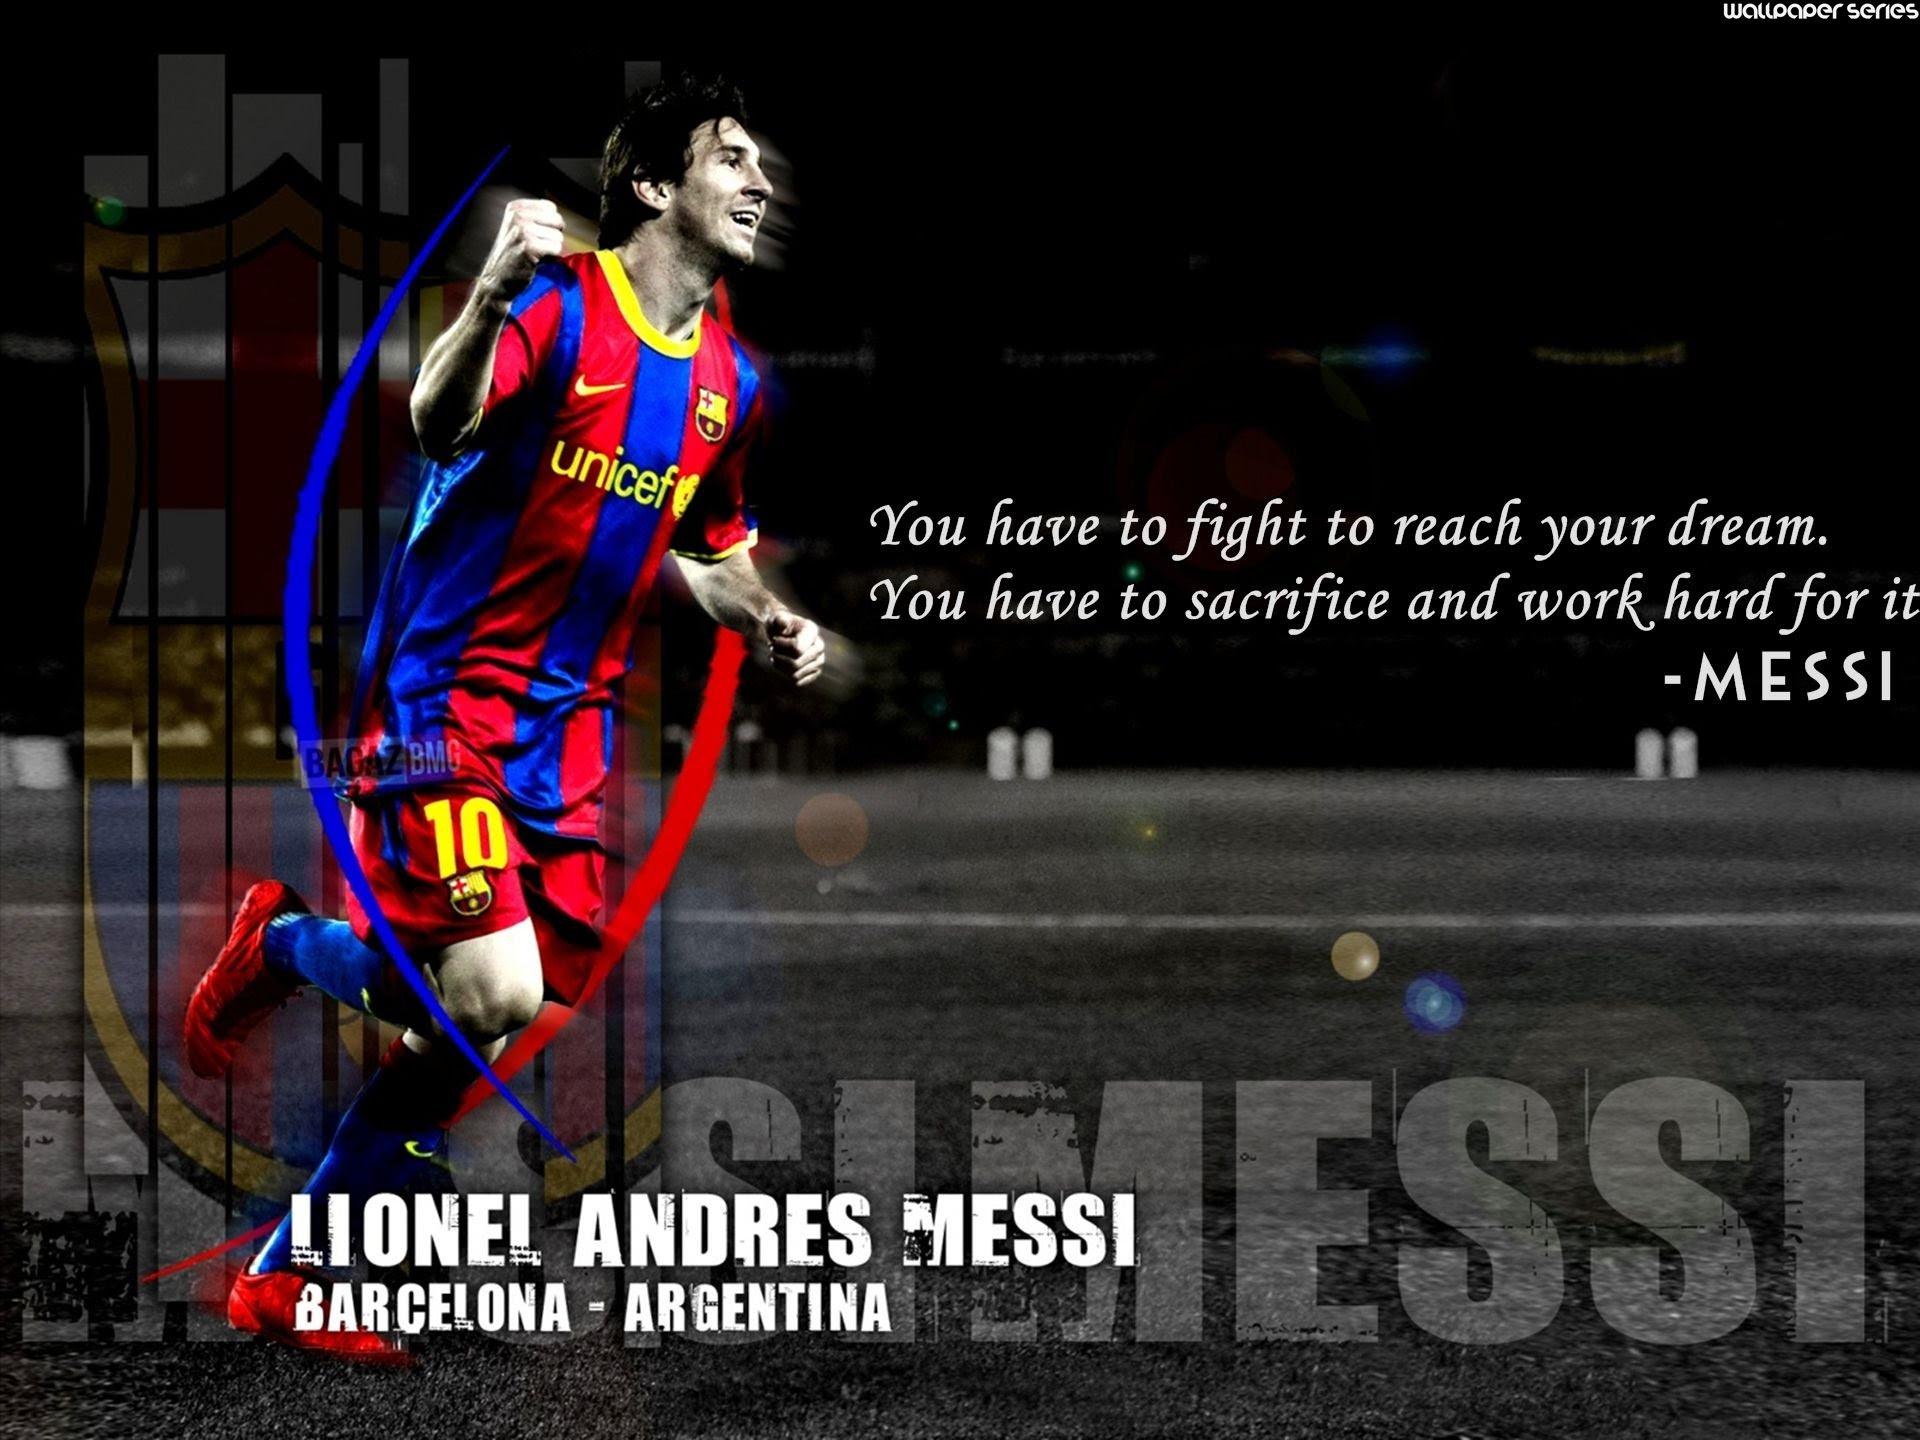 Lionel Messi Dream Motivational Quotes Wallpaper 10735 Baltana